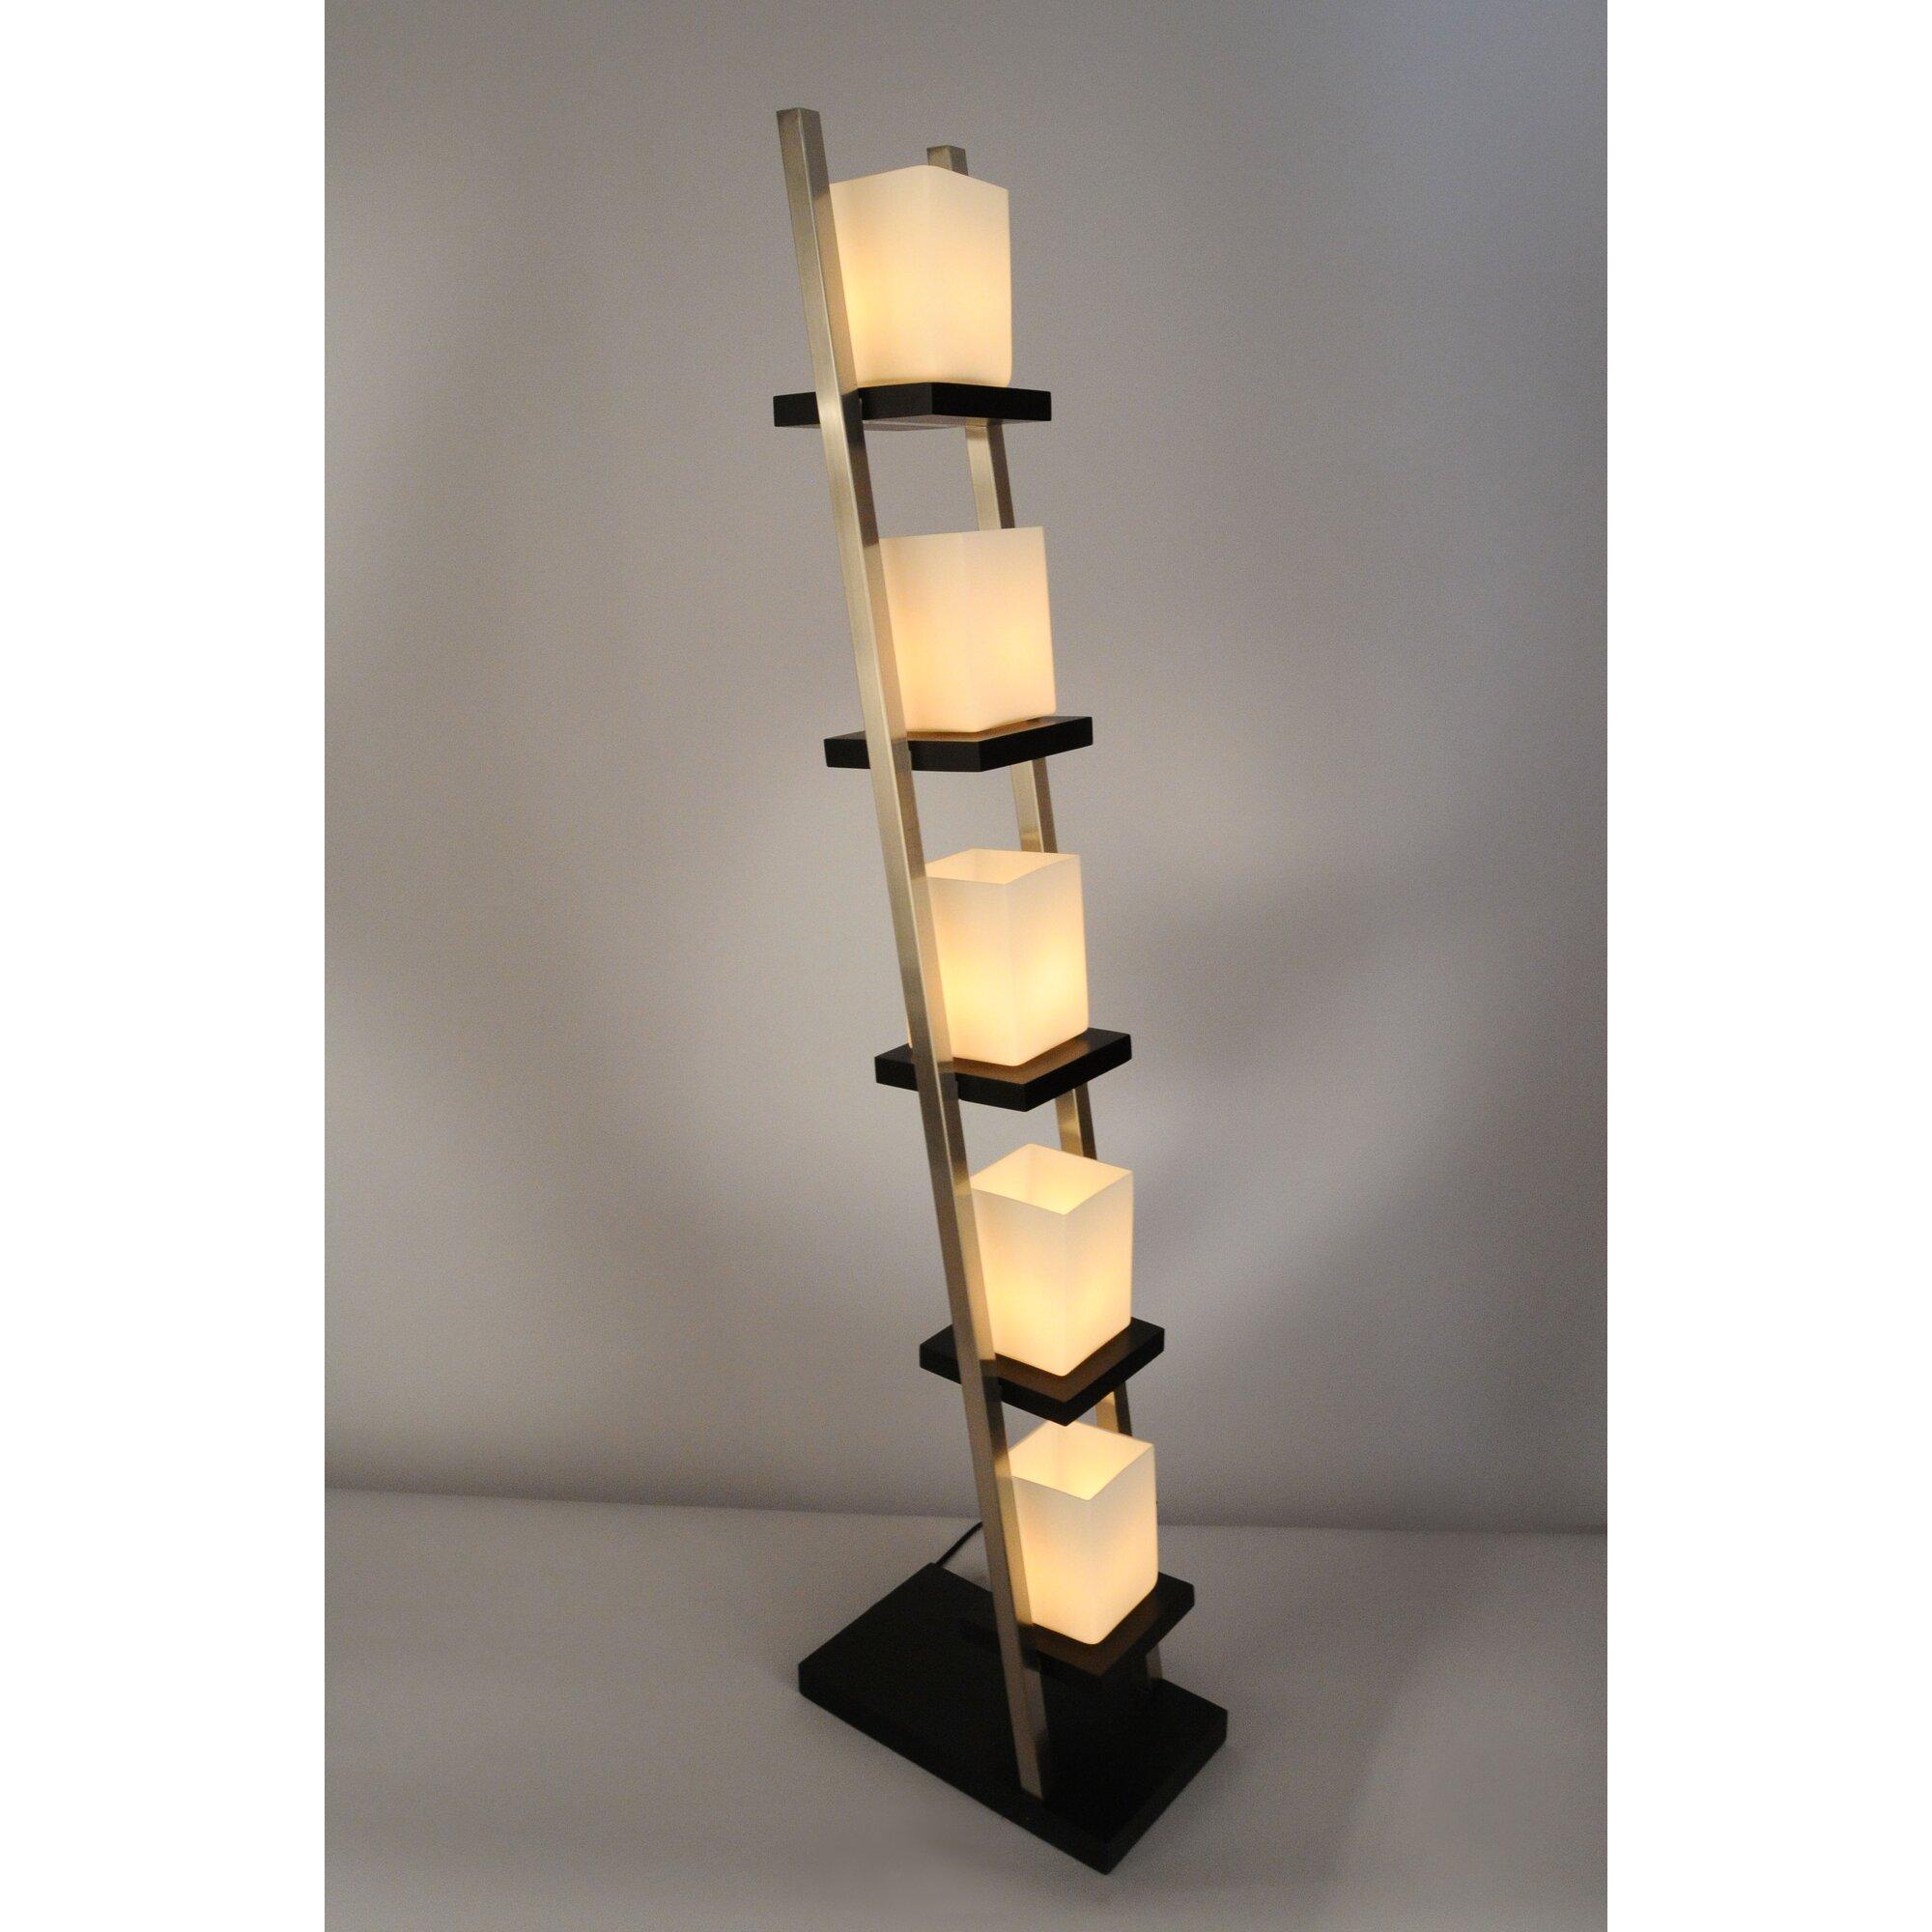 nova of california escalier 61 column floor lamp reviews wayfair. Black Bedroom Furniture Sets. Home Design Ideas